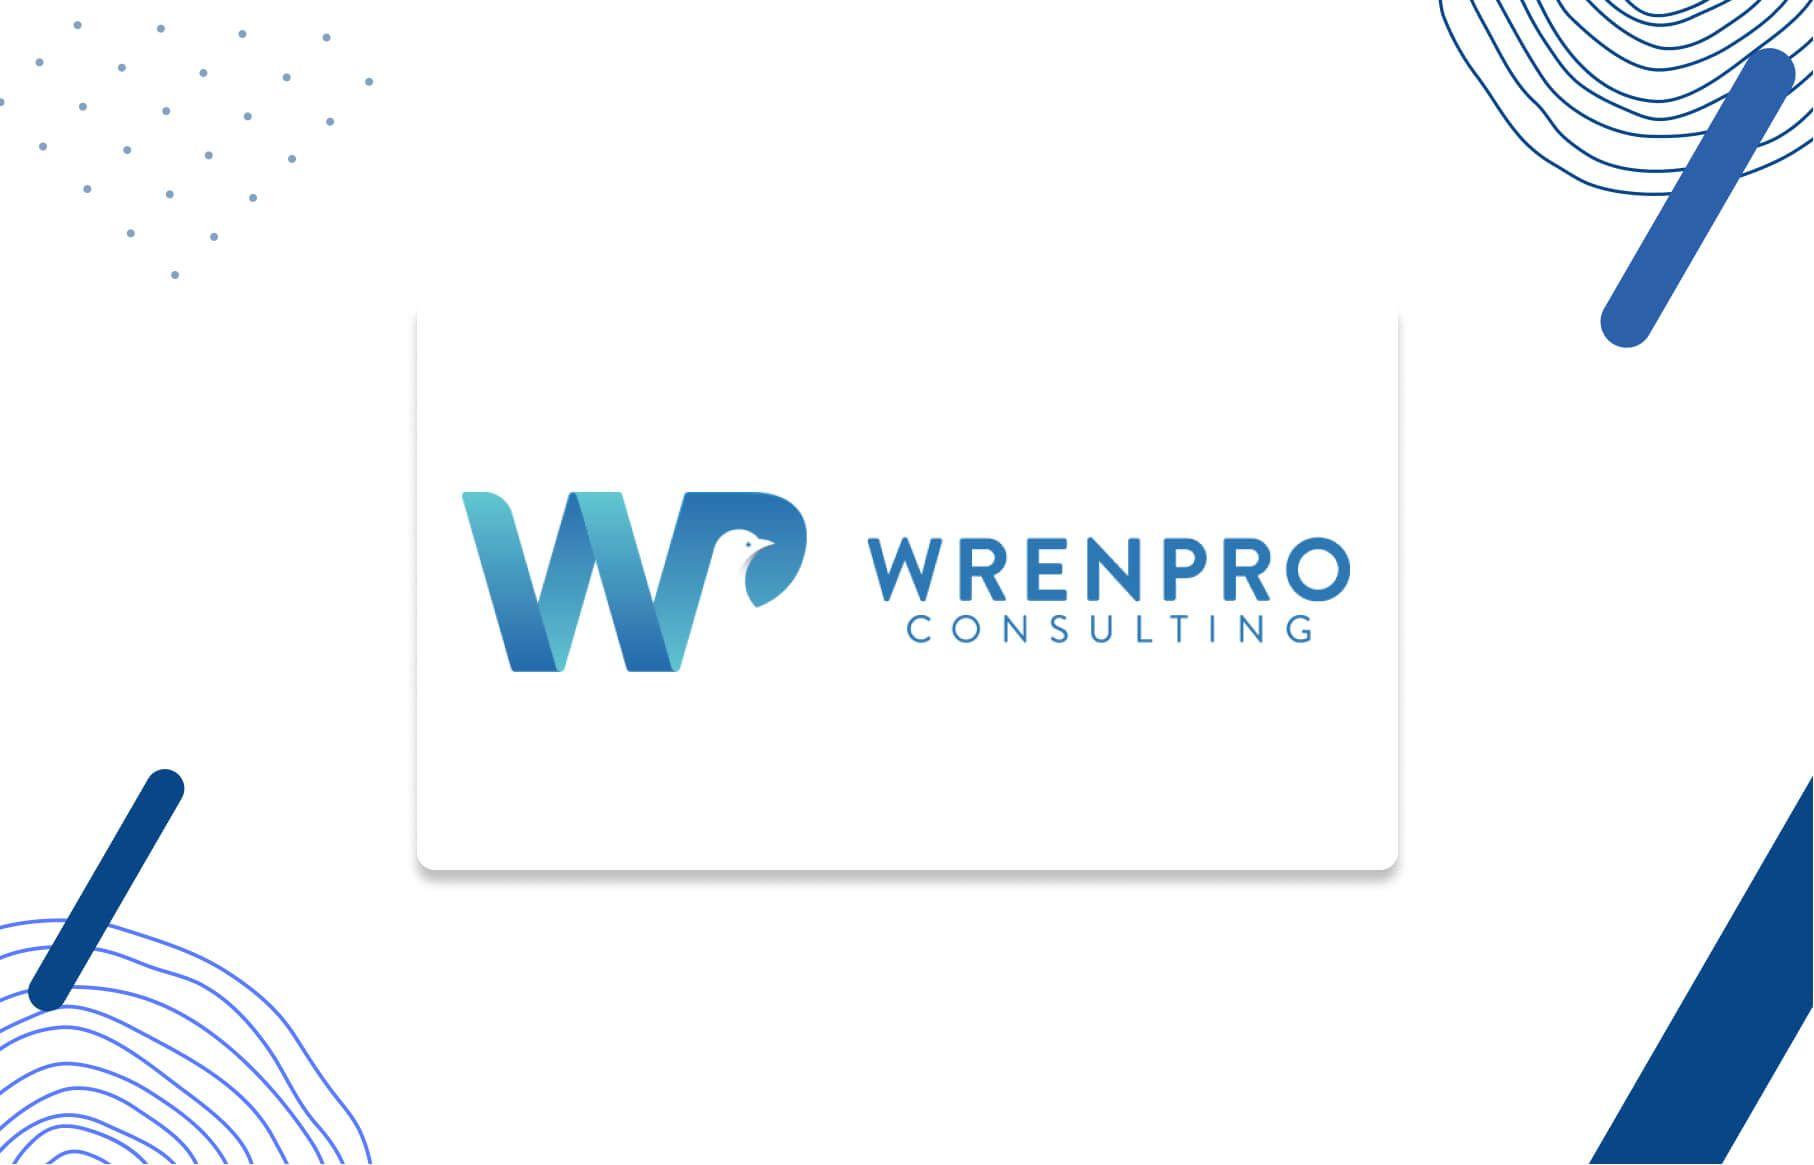 WrenPro Consulting Logo - Digital Marketing